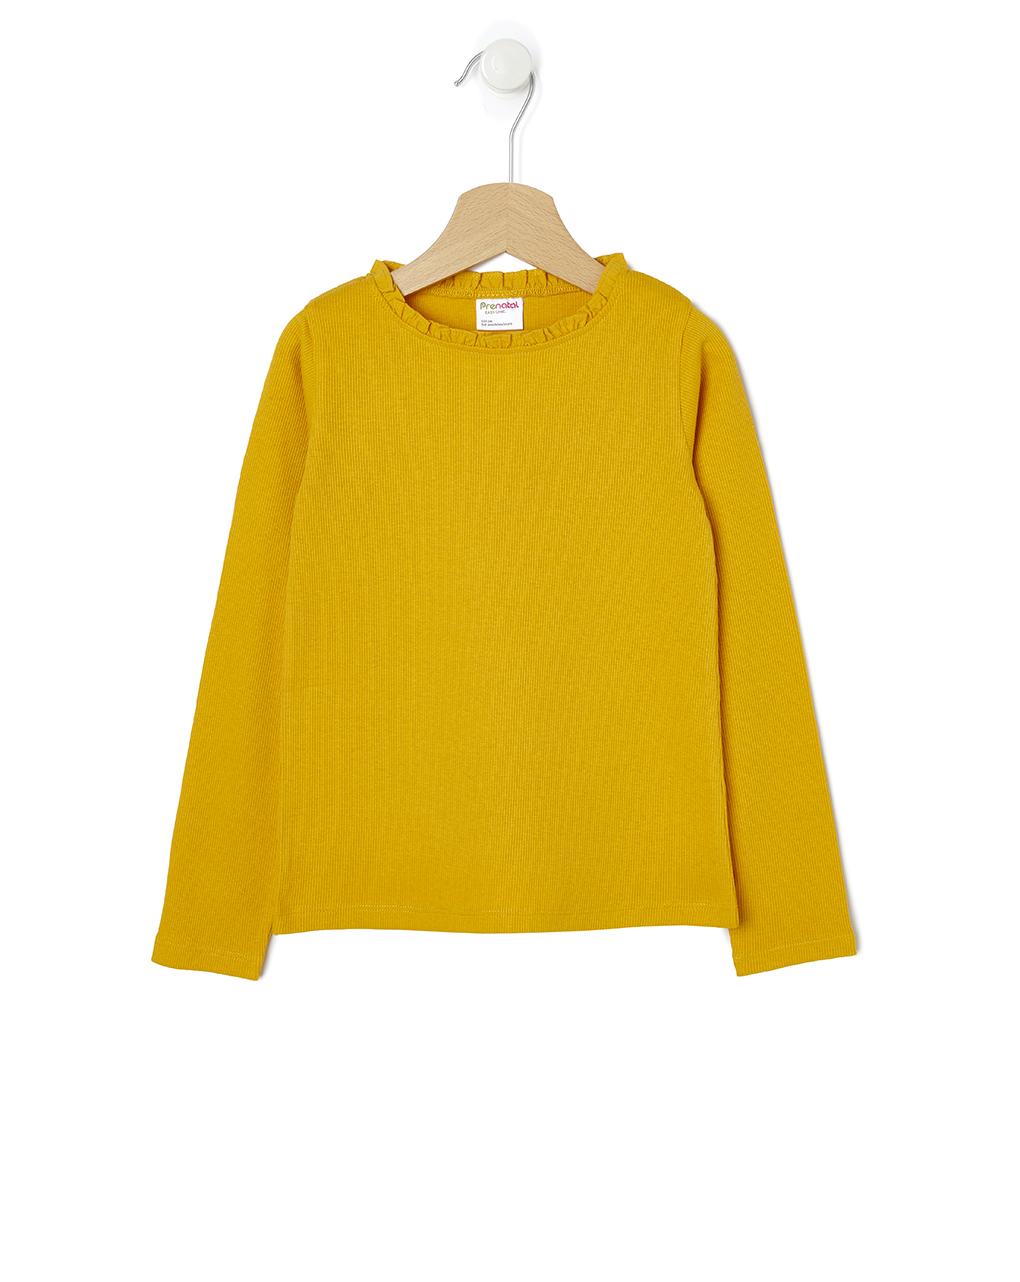 T-shirt Jersey με Ριγωτή Ύφανση Κίτρινο για Κορίτσι